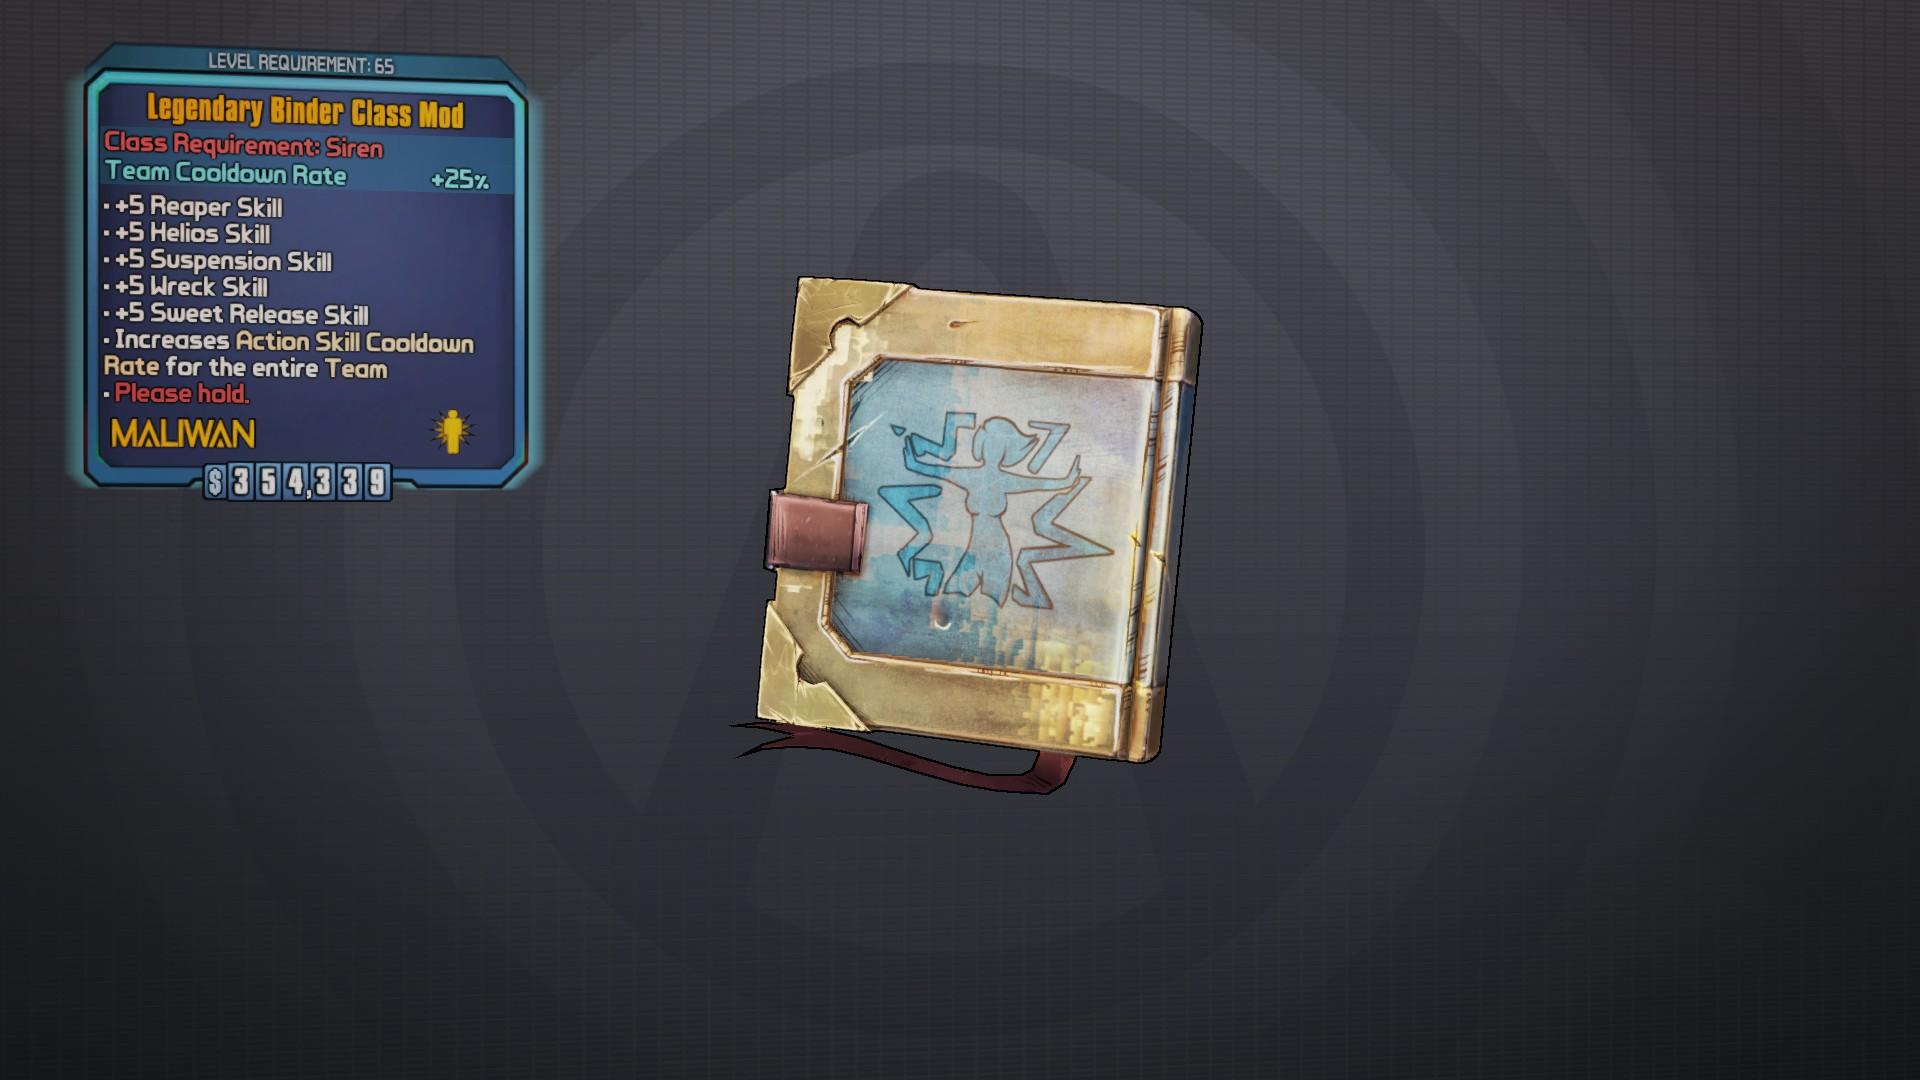 Siren class mods   Borderlands 2 Save Editor Weapon Codes  2019-05-04